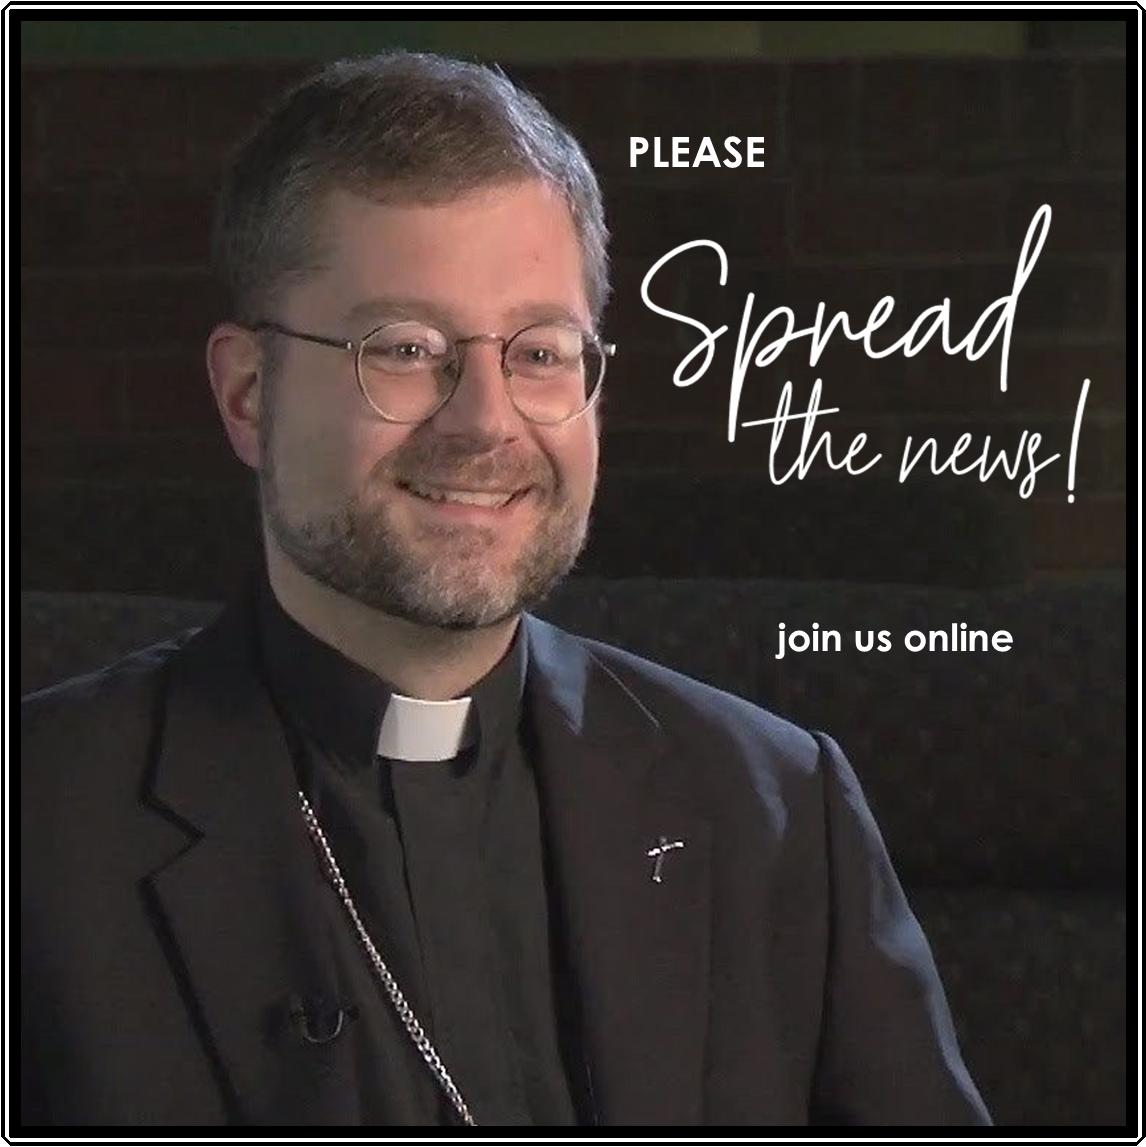 Welcome Bishop Dowd!